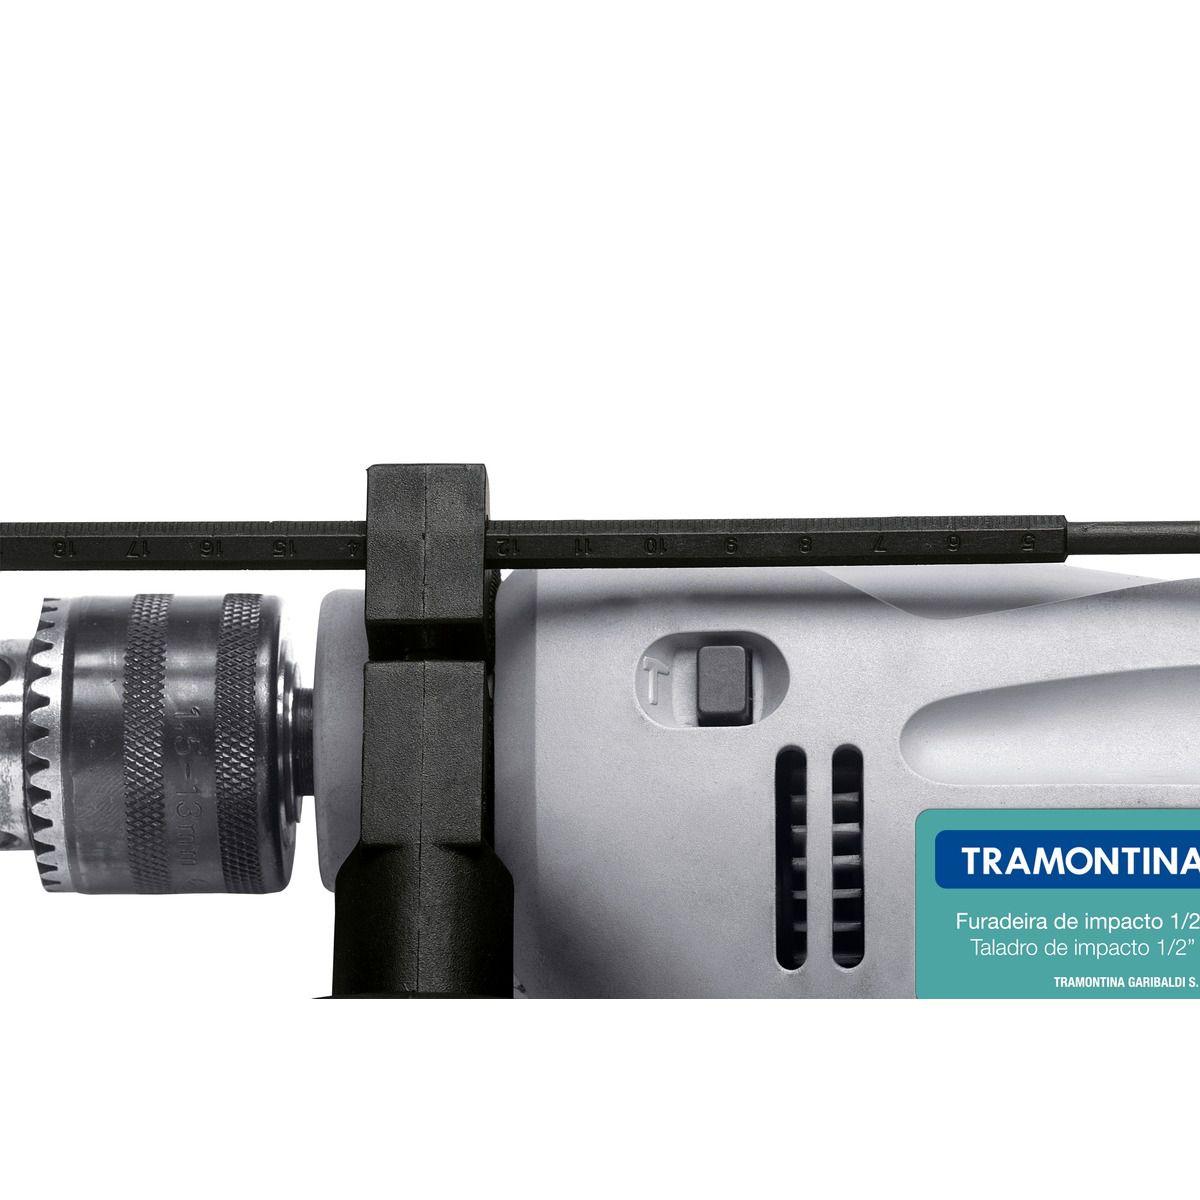 FURADEIRA IMPACTO 127V/500W 1/2 TRAMONTINA